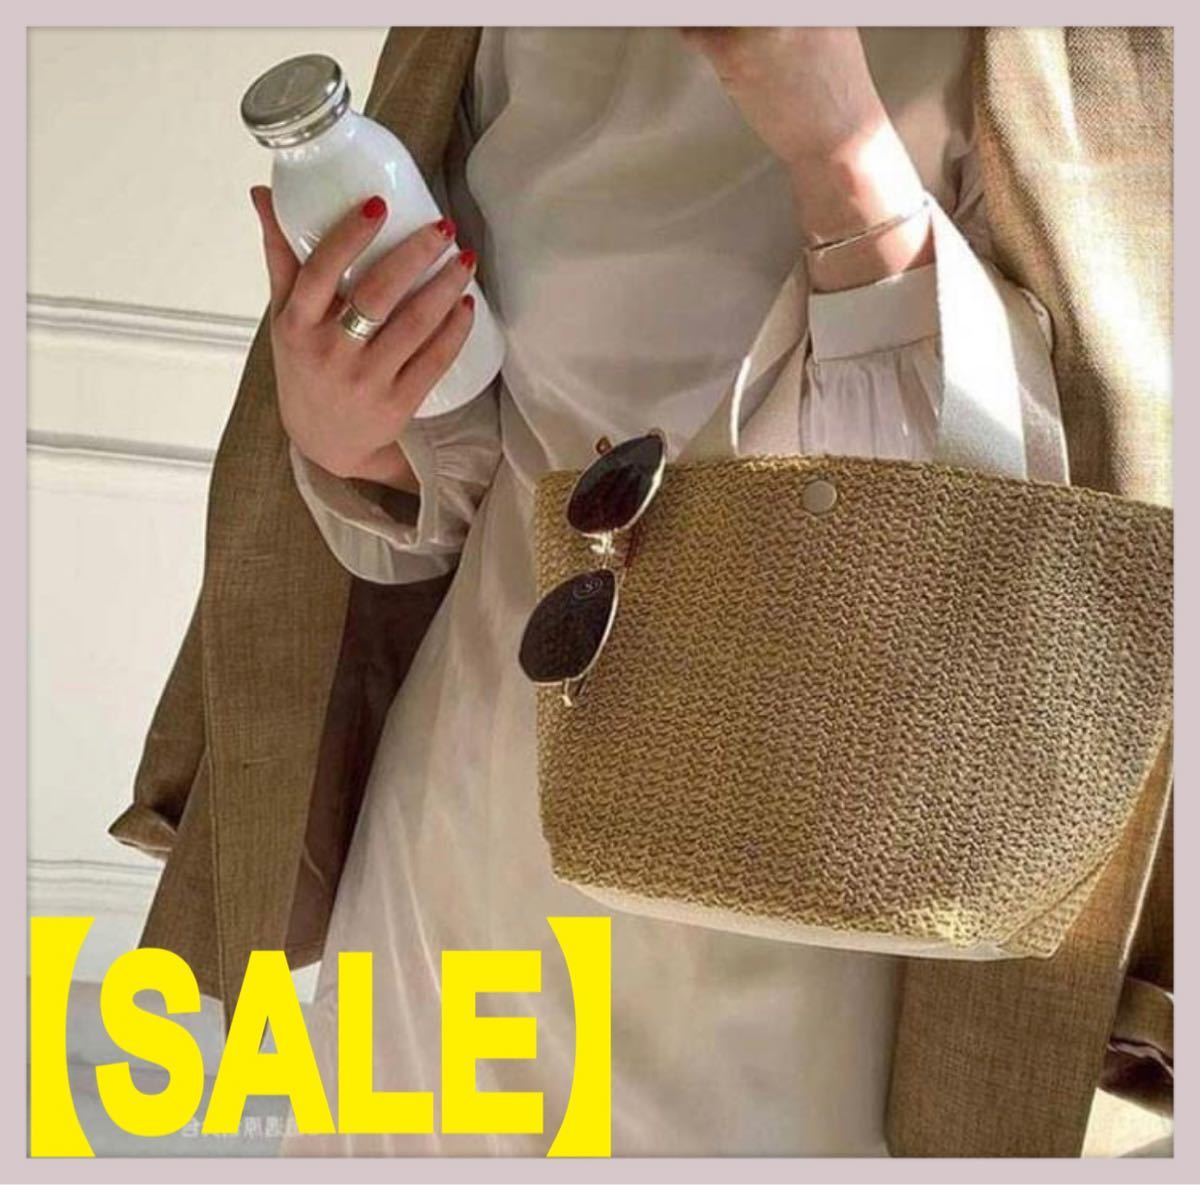 【SALE】かごバッグ トートバッグ エコバッグ マザーズバッグ ハンドバッグ